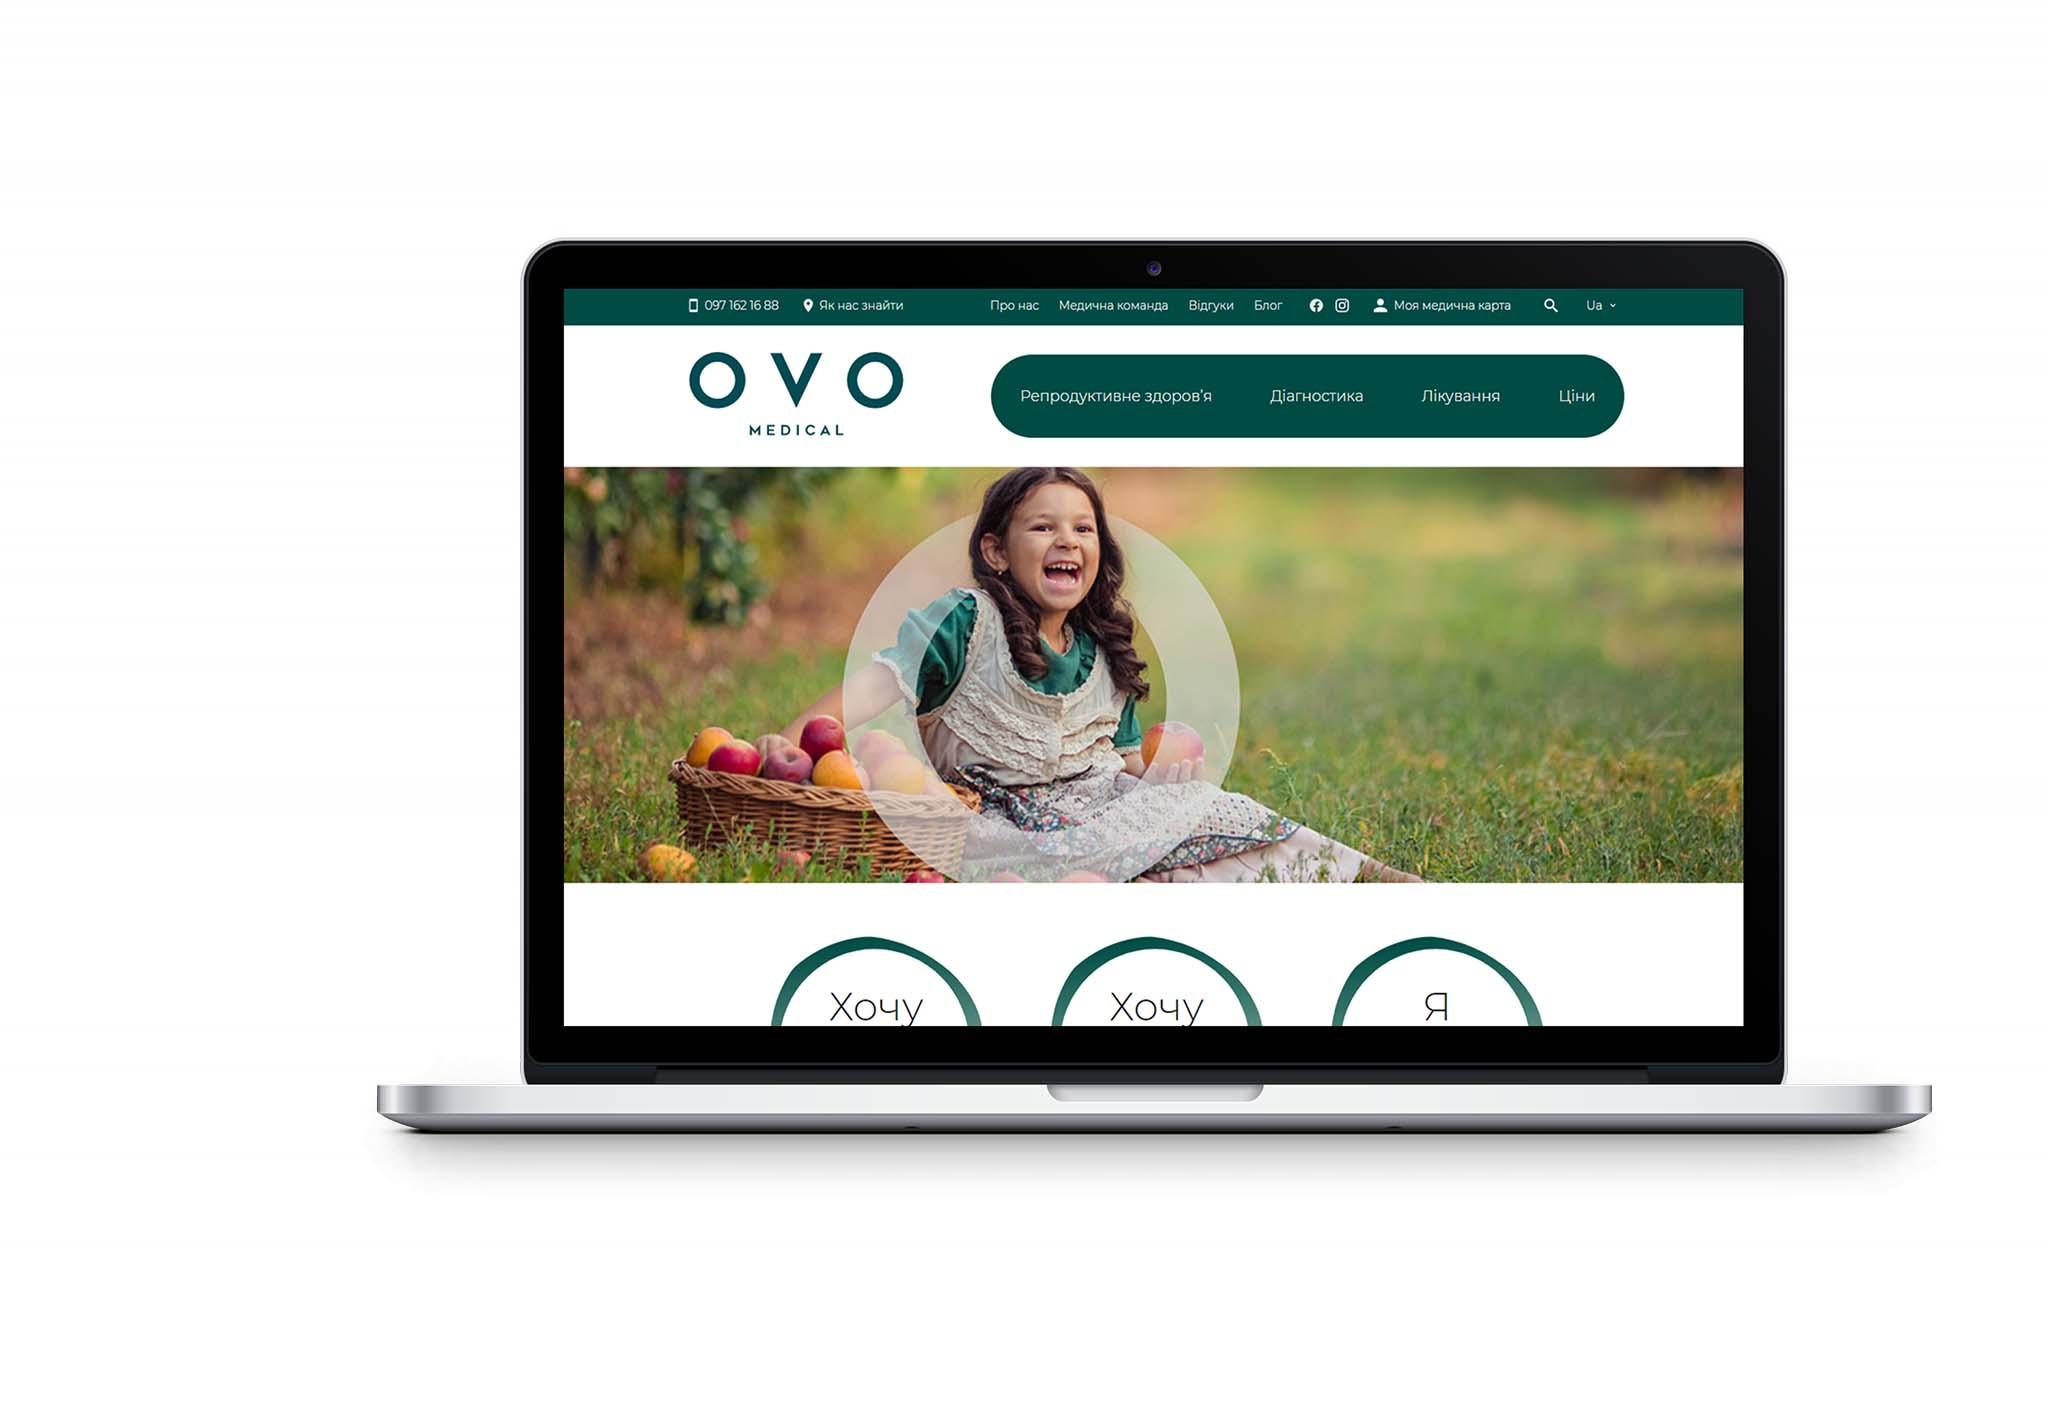 Вебсайт для Ovo Medical